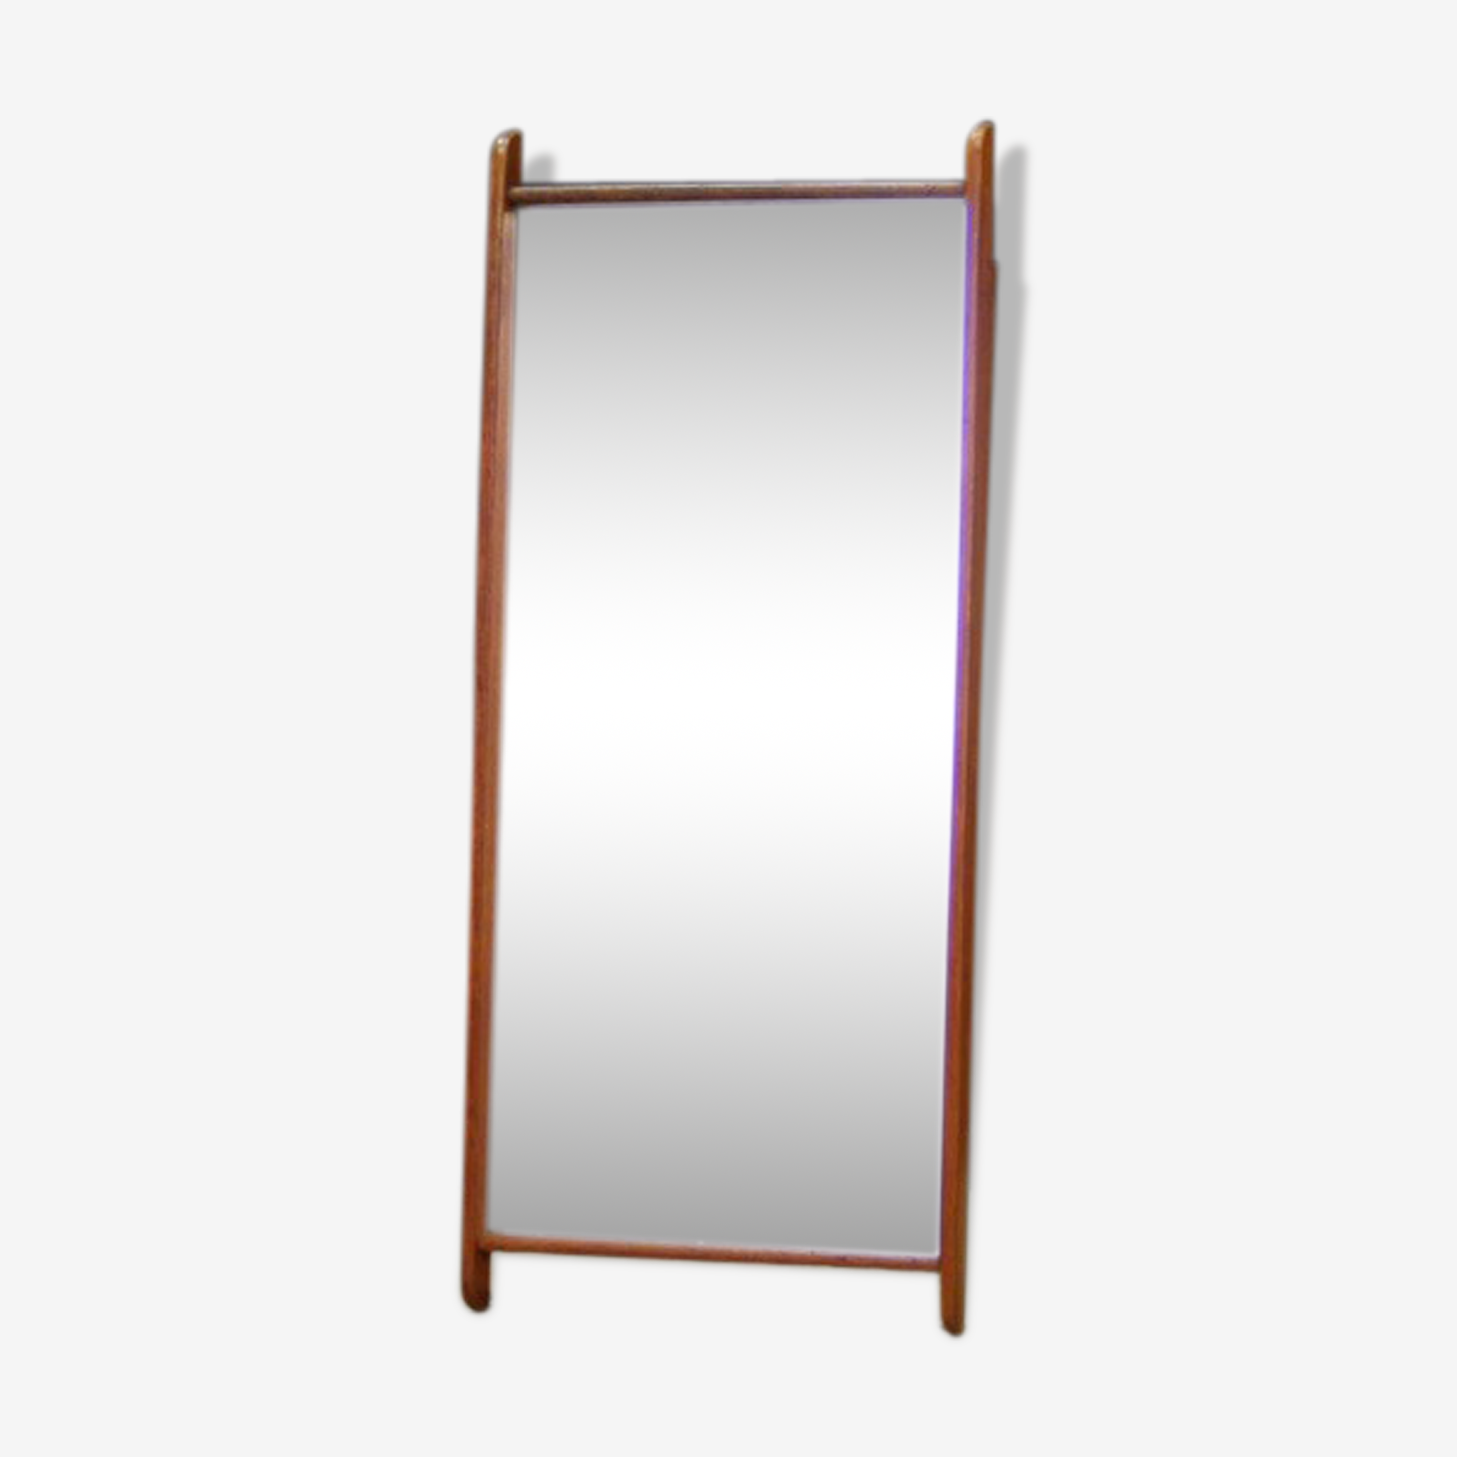 Miroir design danois 60's 95x40cm